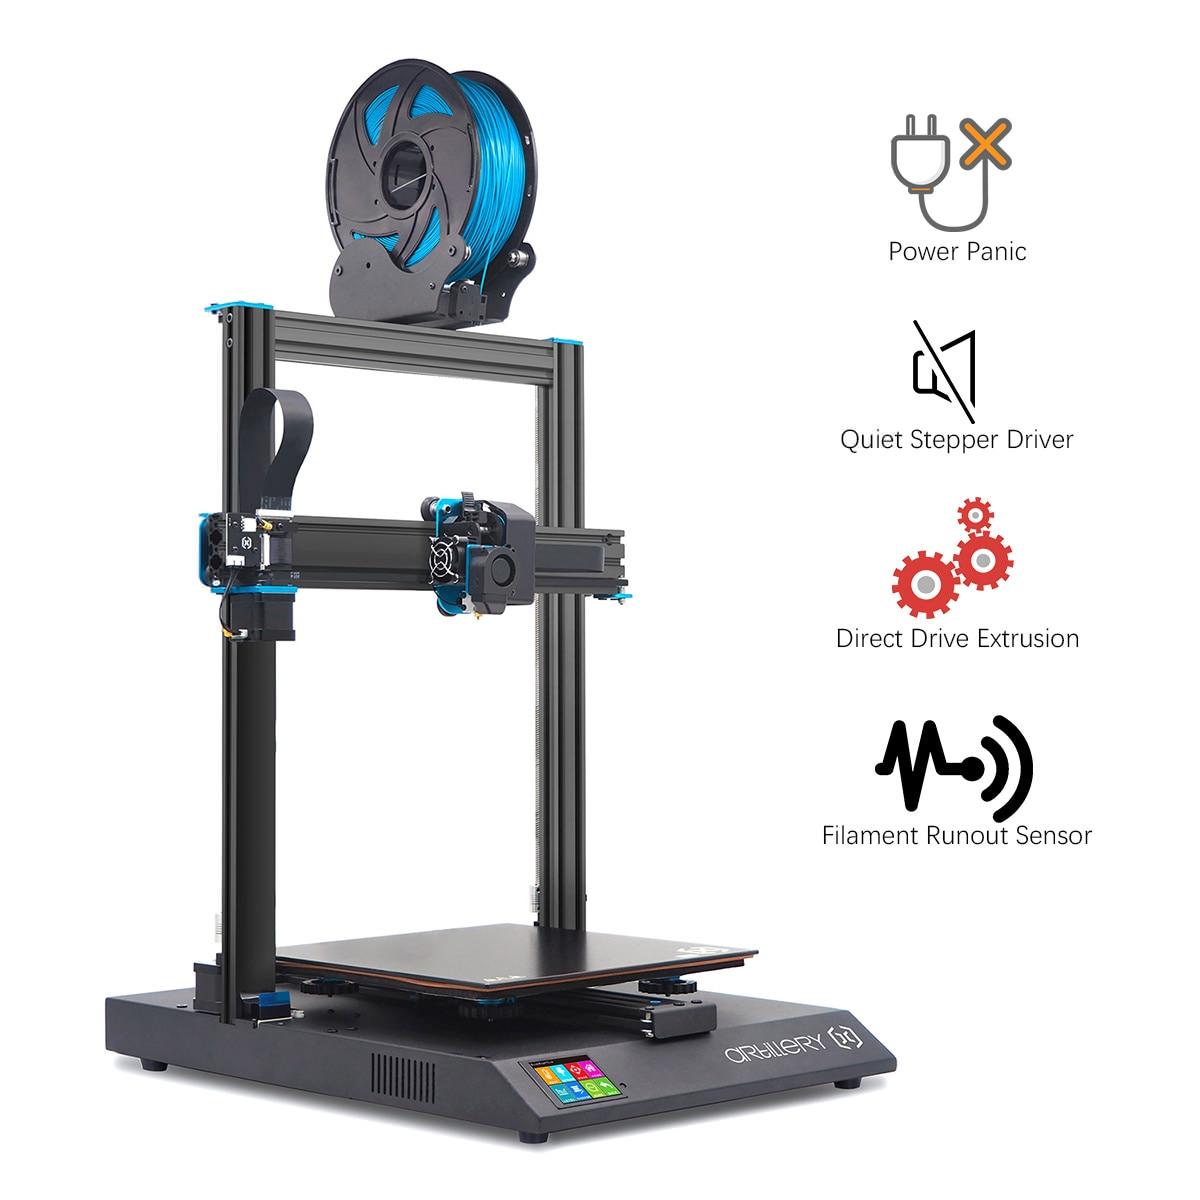 Artillery Sidewinder-X1 Multi-function 3D Printer with Aluminum Extrusion Frame & Filament Runout Sensor